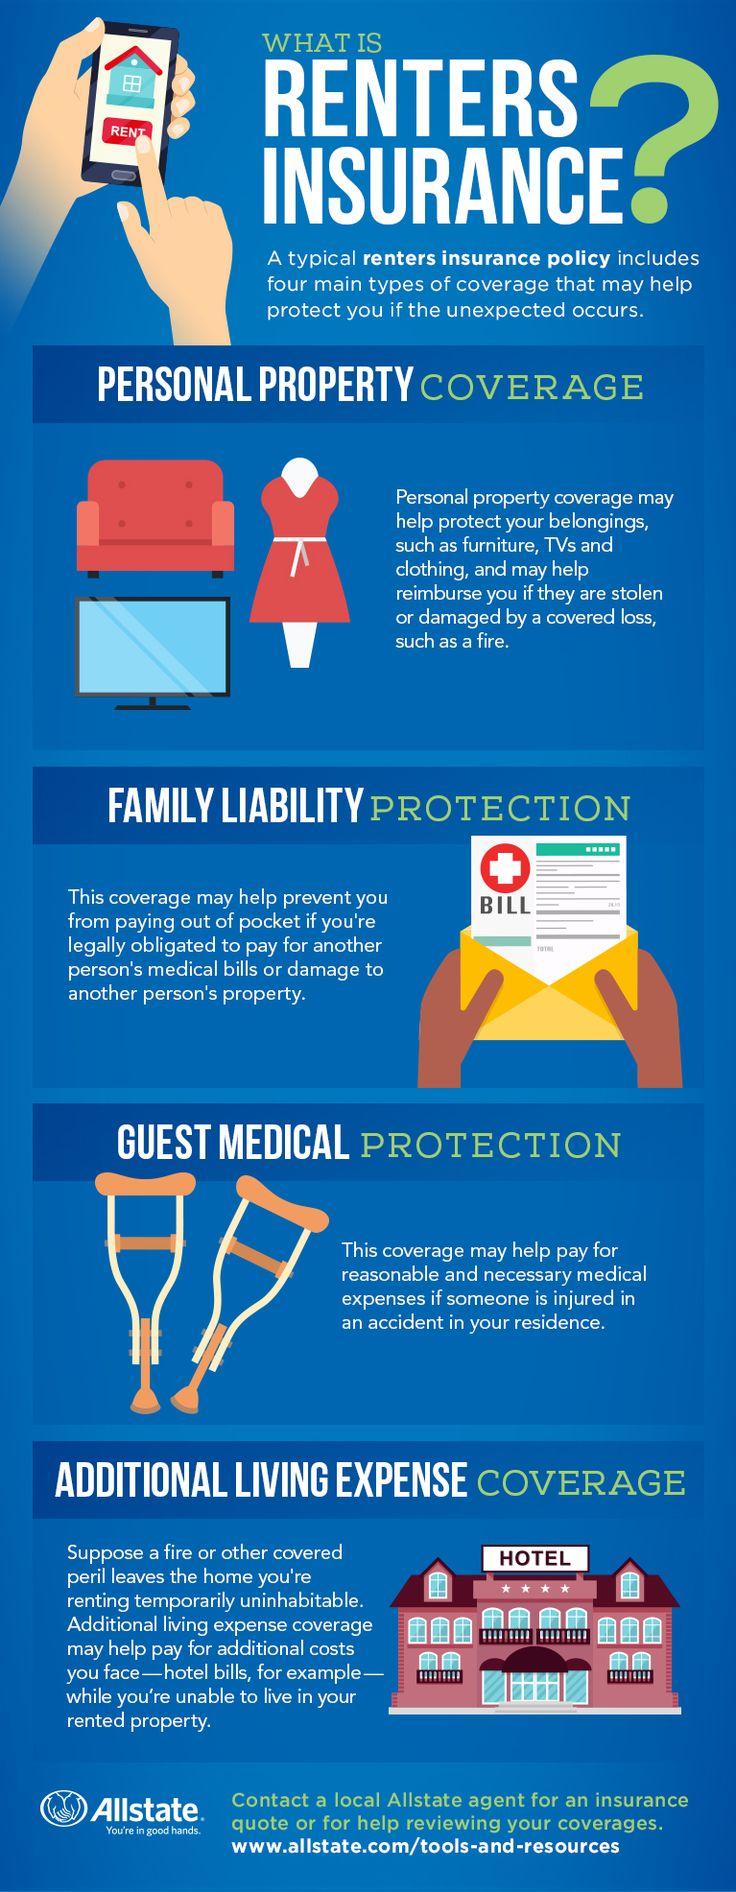 17 Best Ideas About Renters Insurance On Pinterest